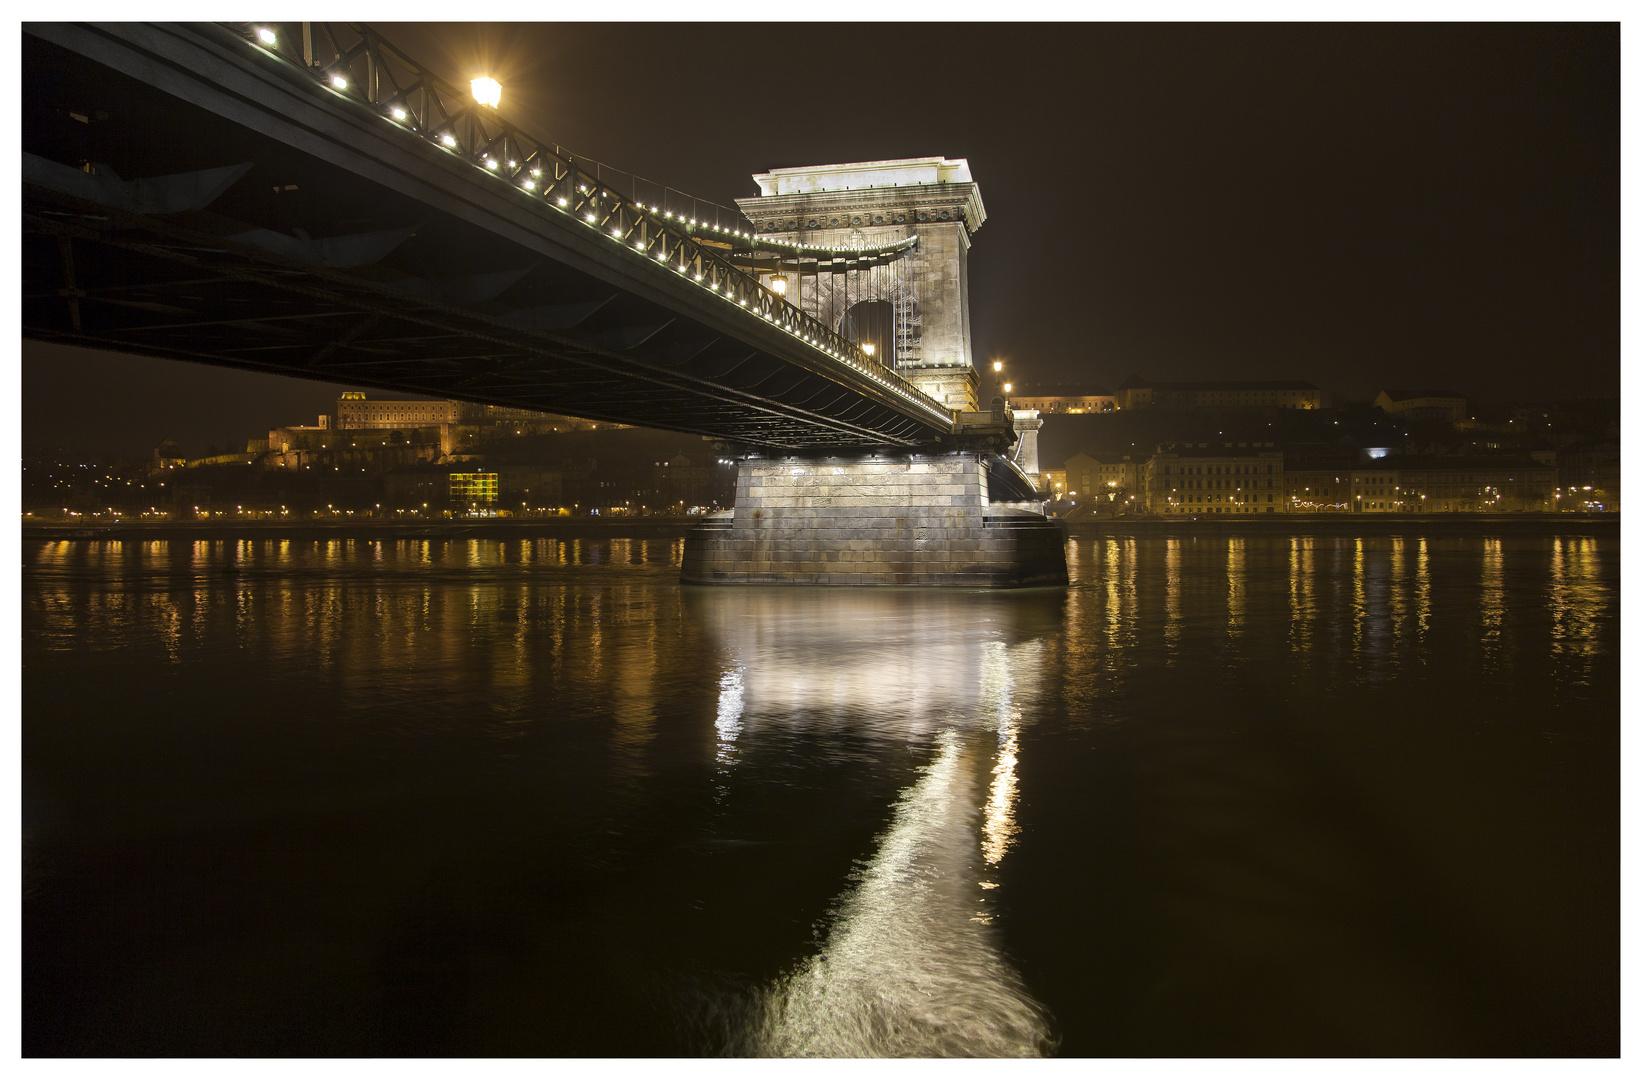 Nights Bridge